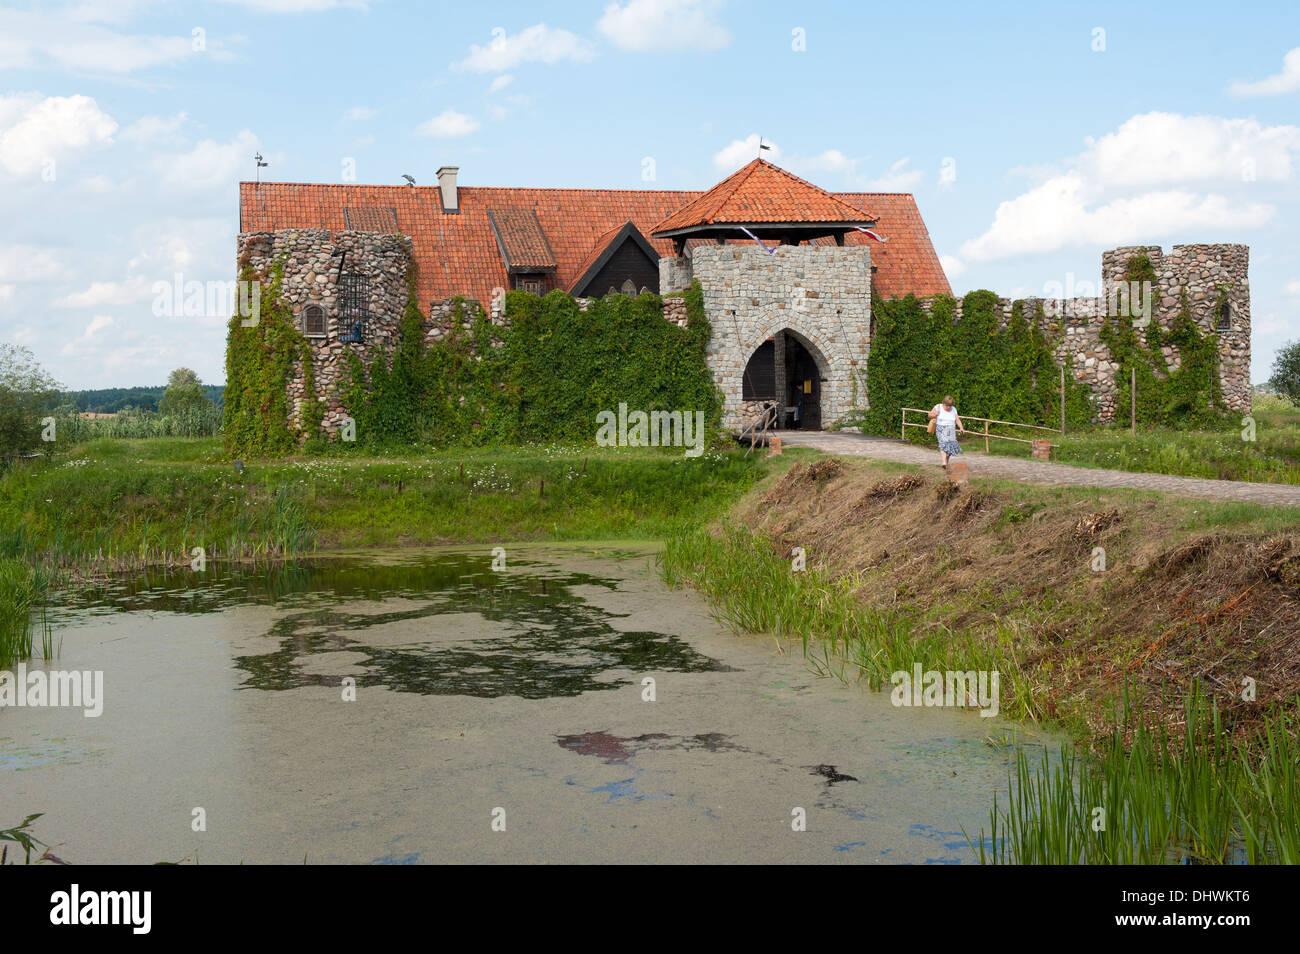 Kiermusy, Gmina Tykocin, Białystok County, Podlaskie Voivodeship, Poland - Stock Image